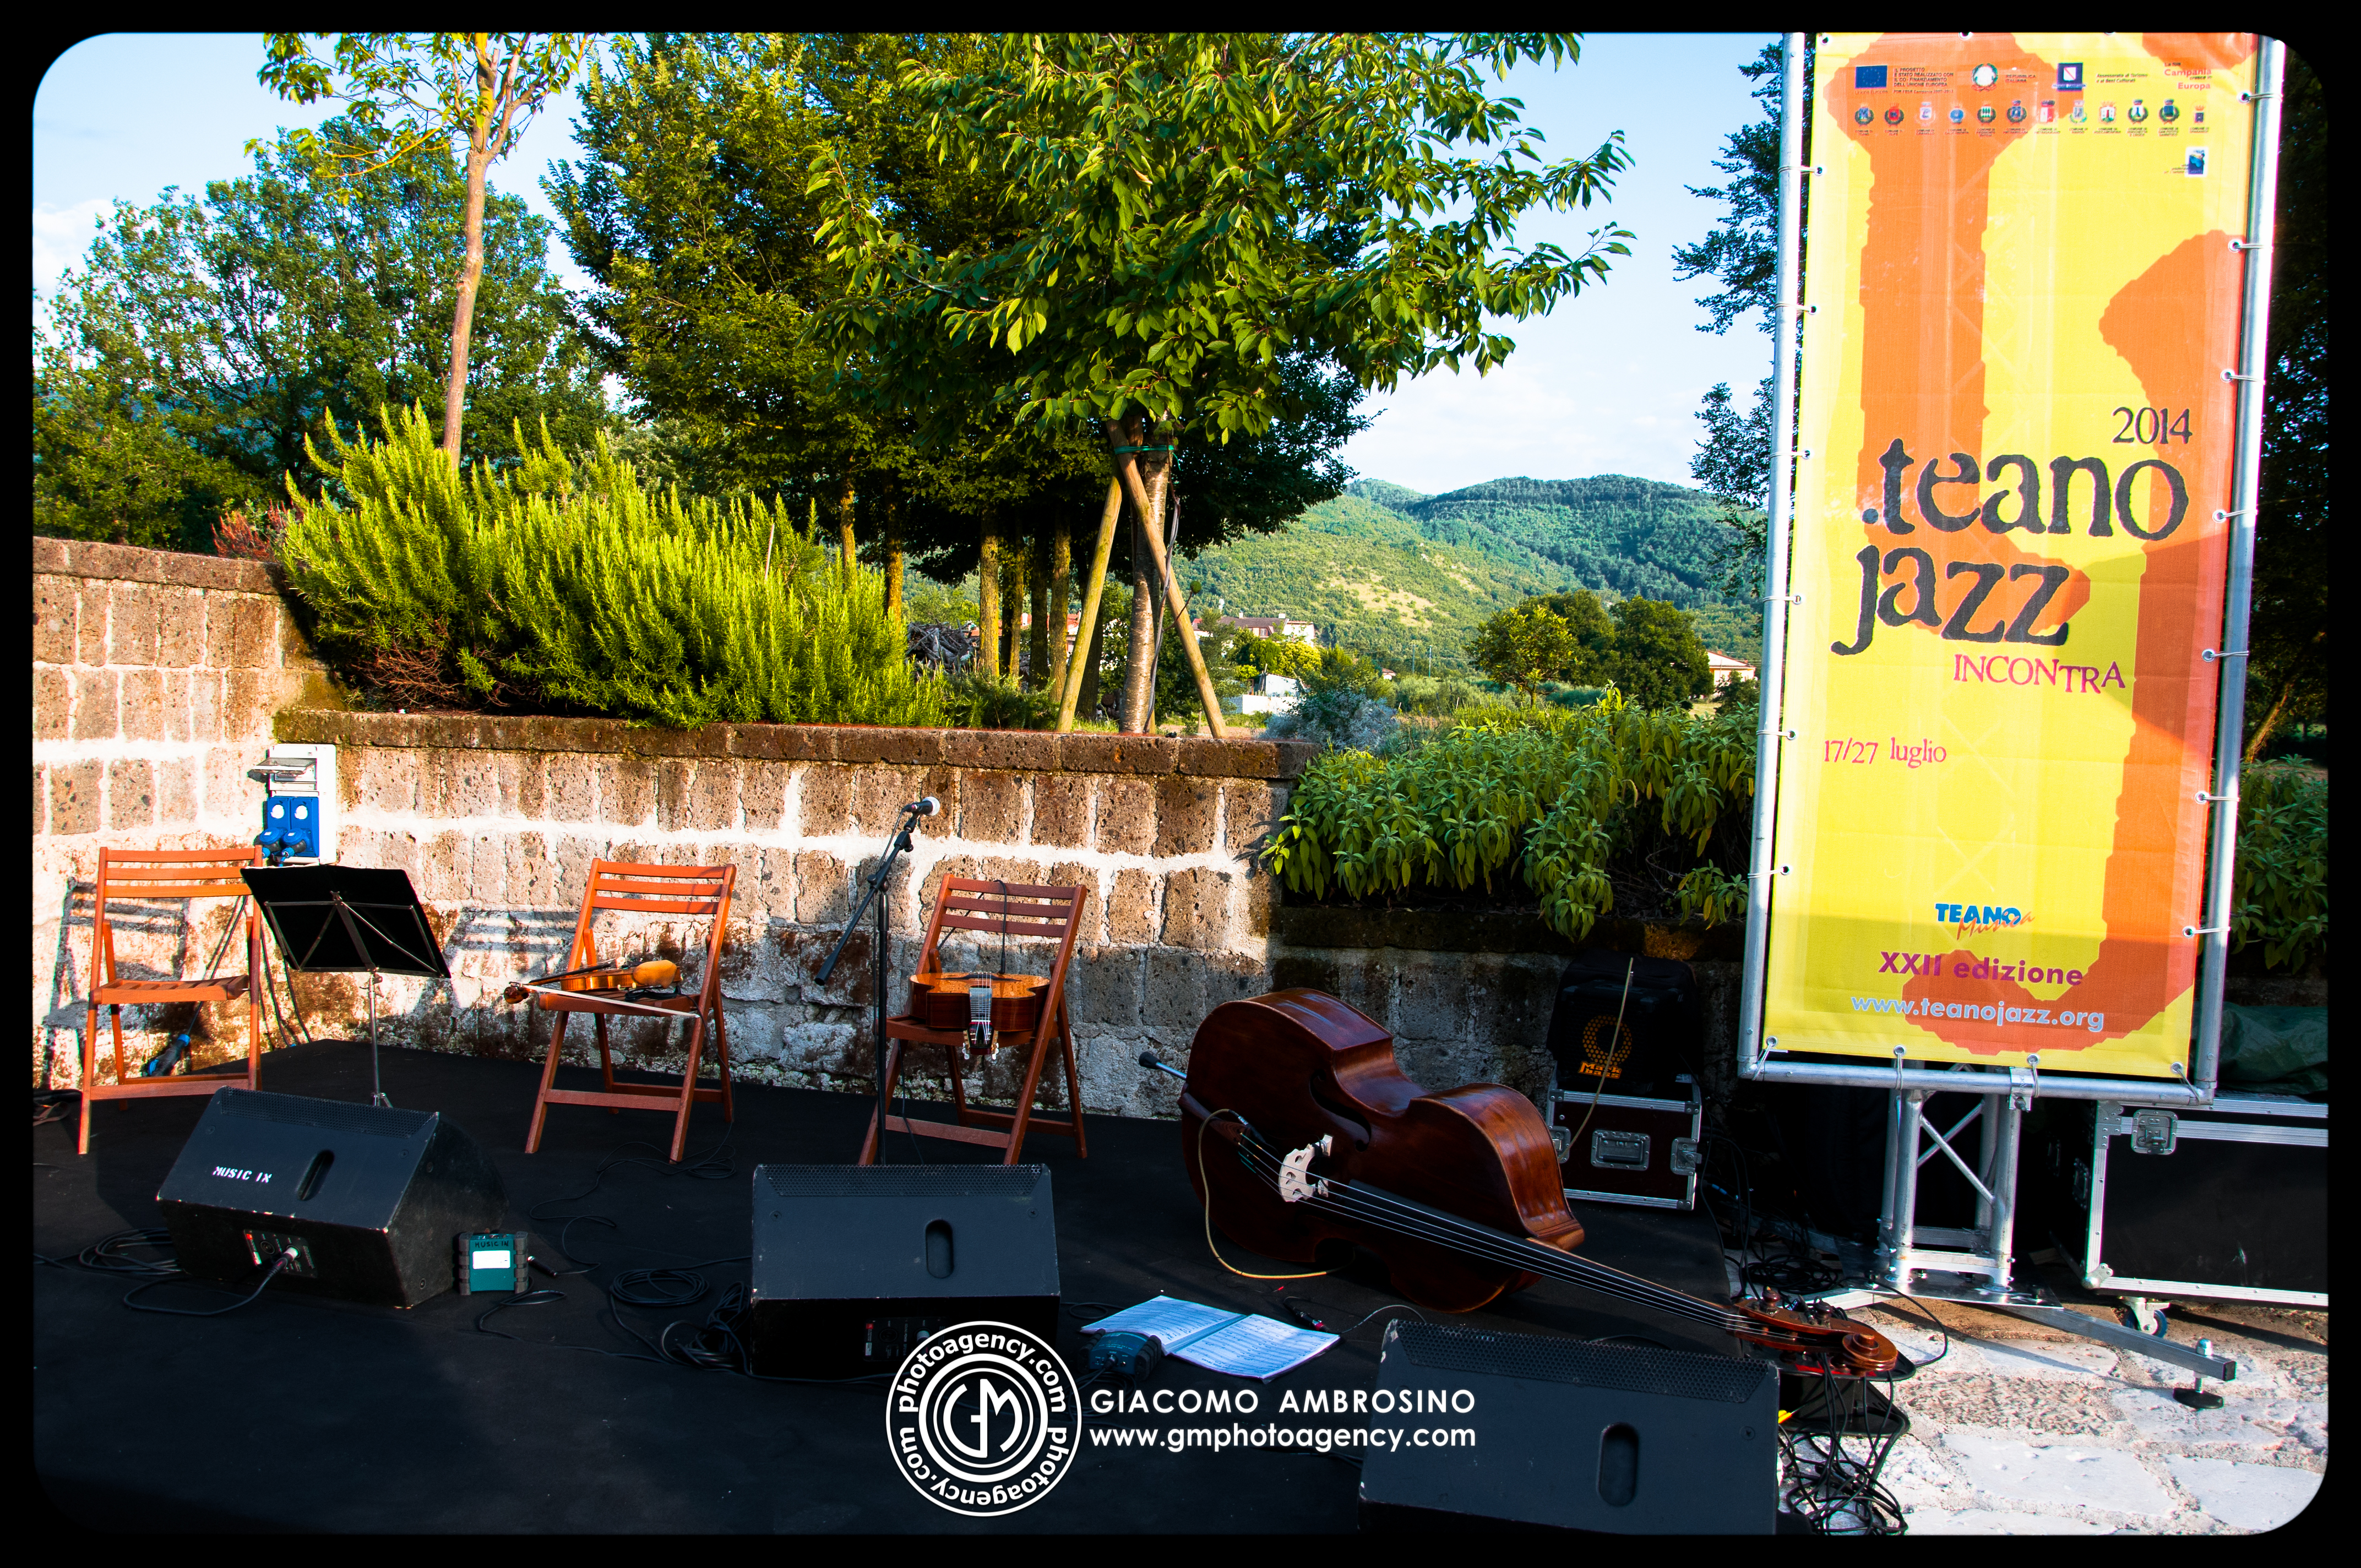 Teano Jazz 2014 – Montmartre Quartet e Nuevo Tango Ensemble (Riardo)